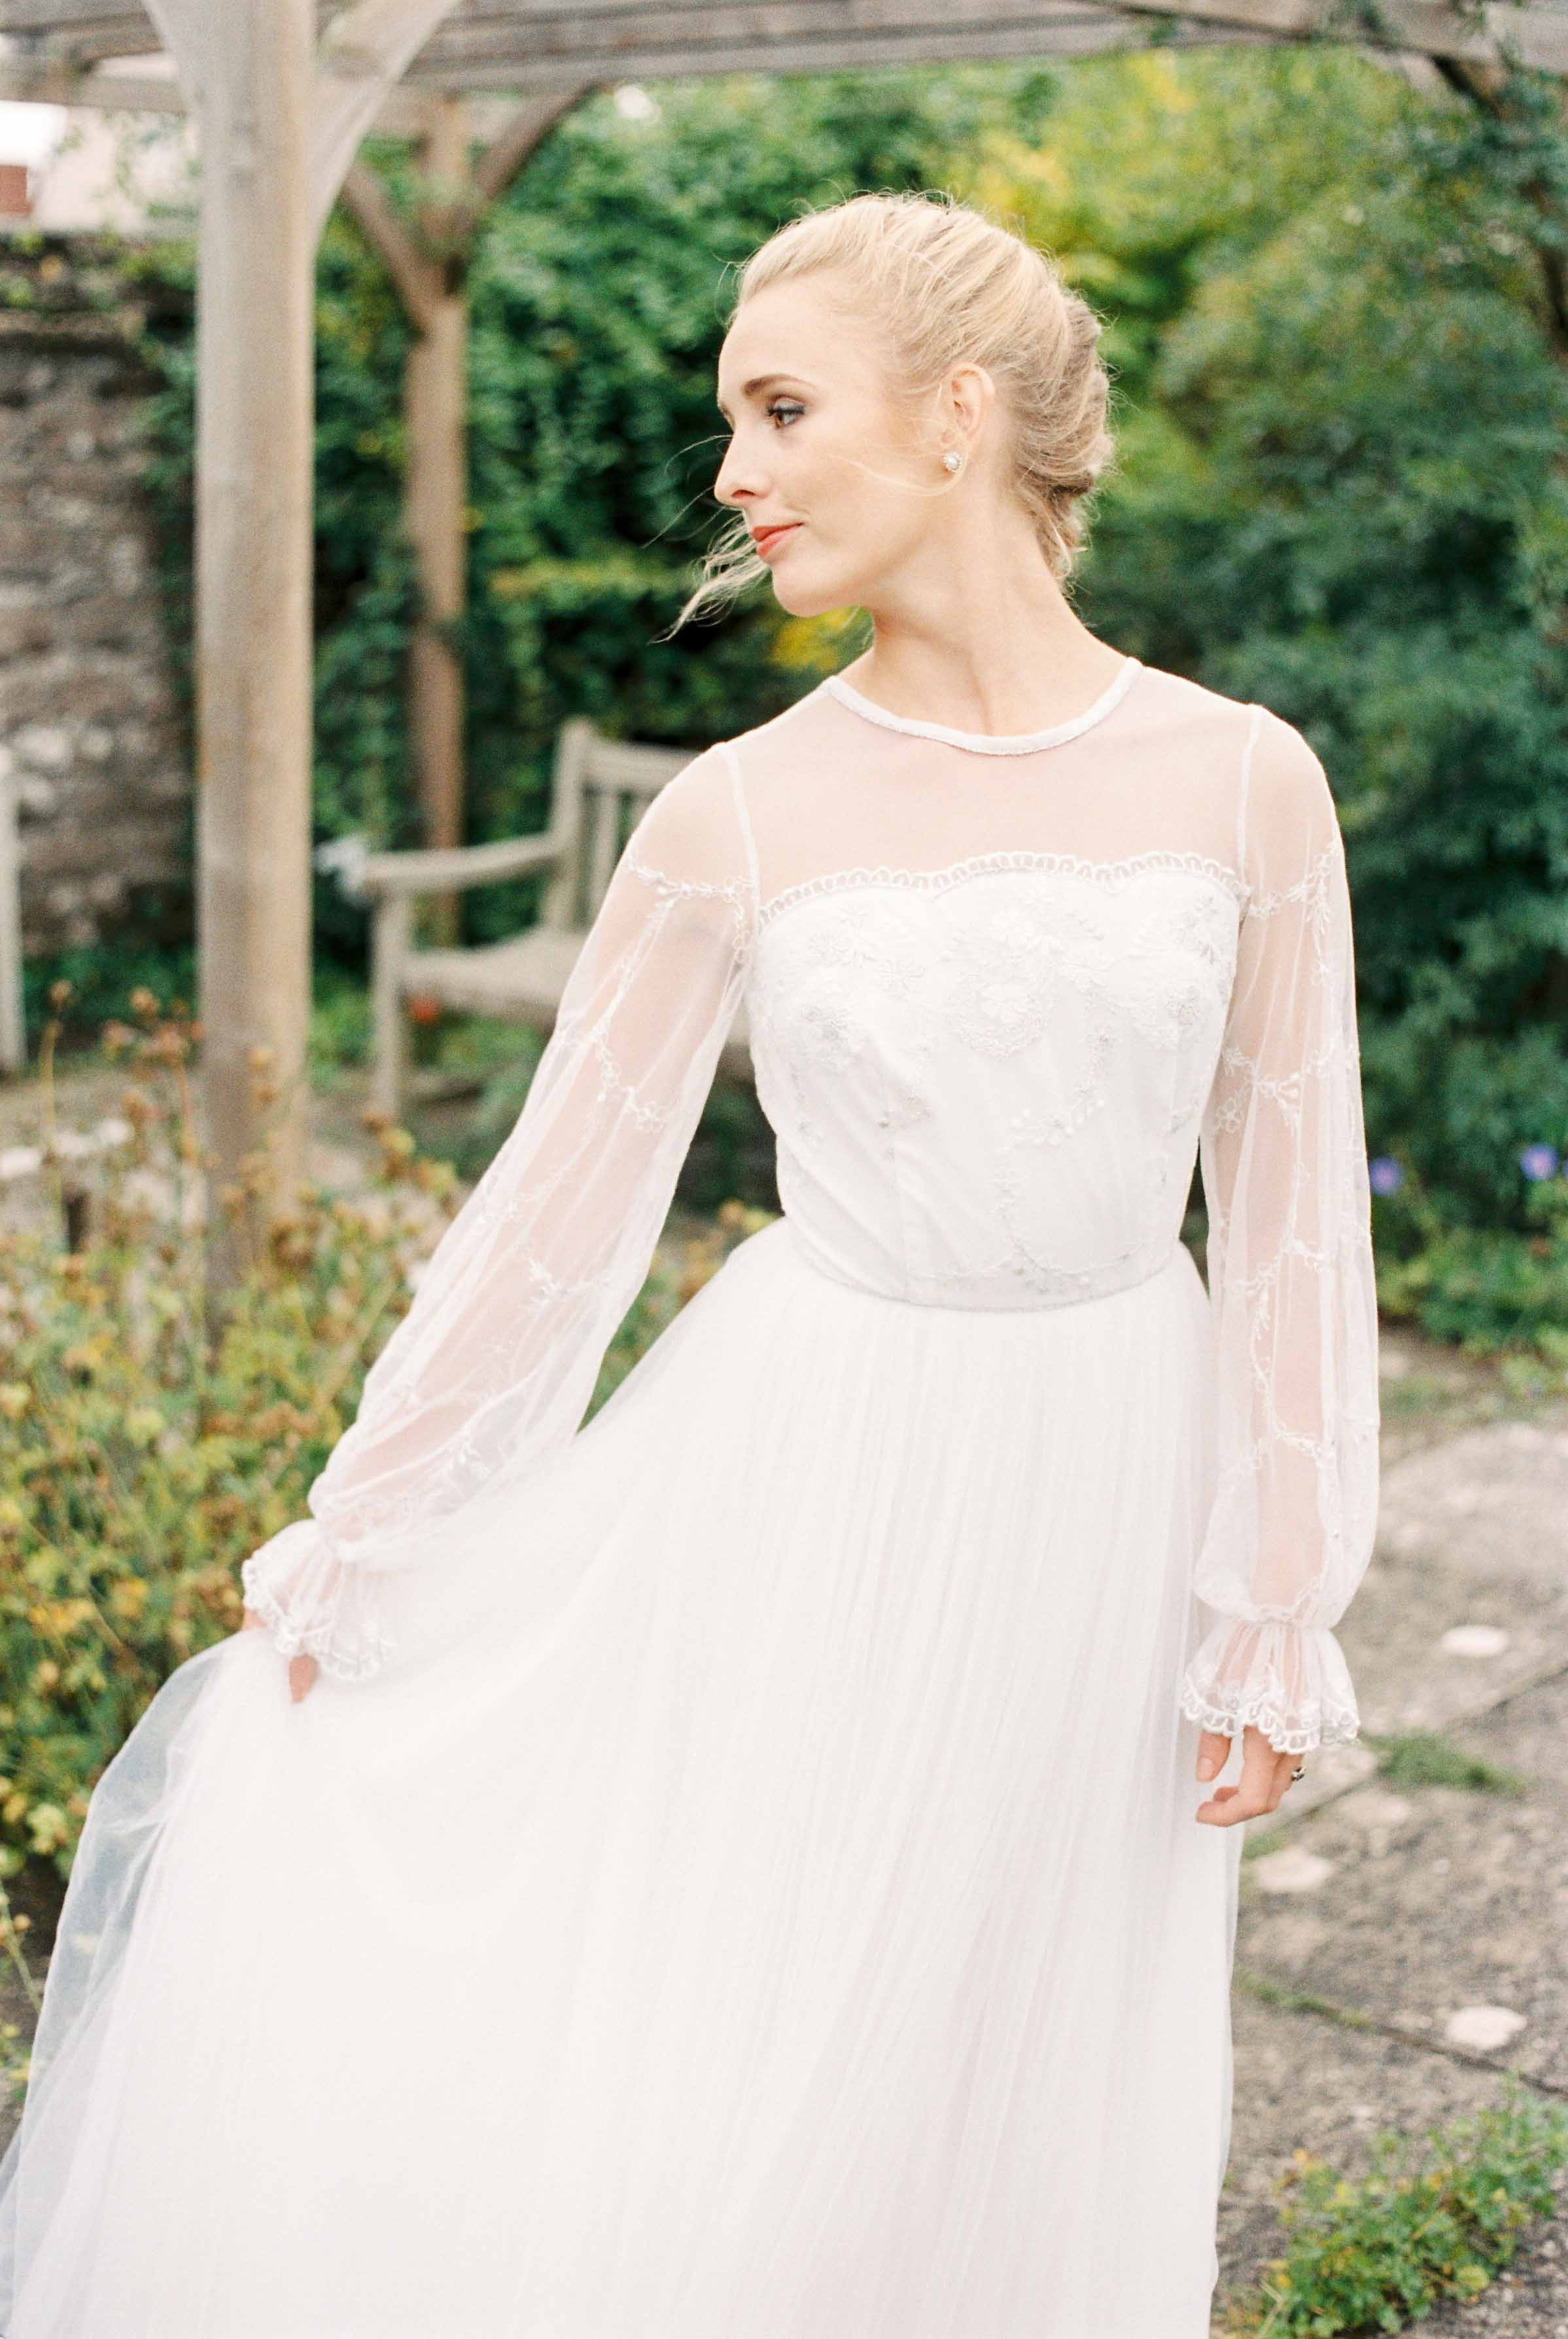 dorset-fine-art-wedding-photographer_amelia_carmencita_lores-2-of-24